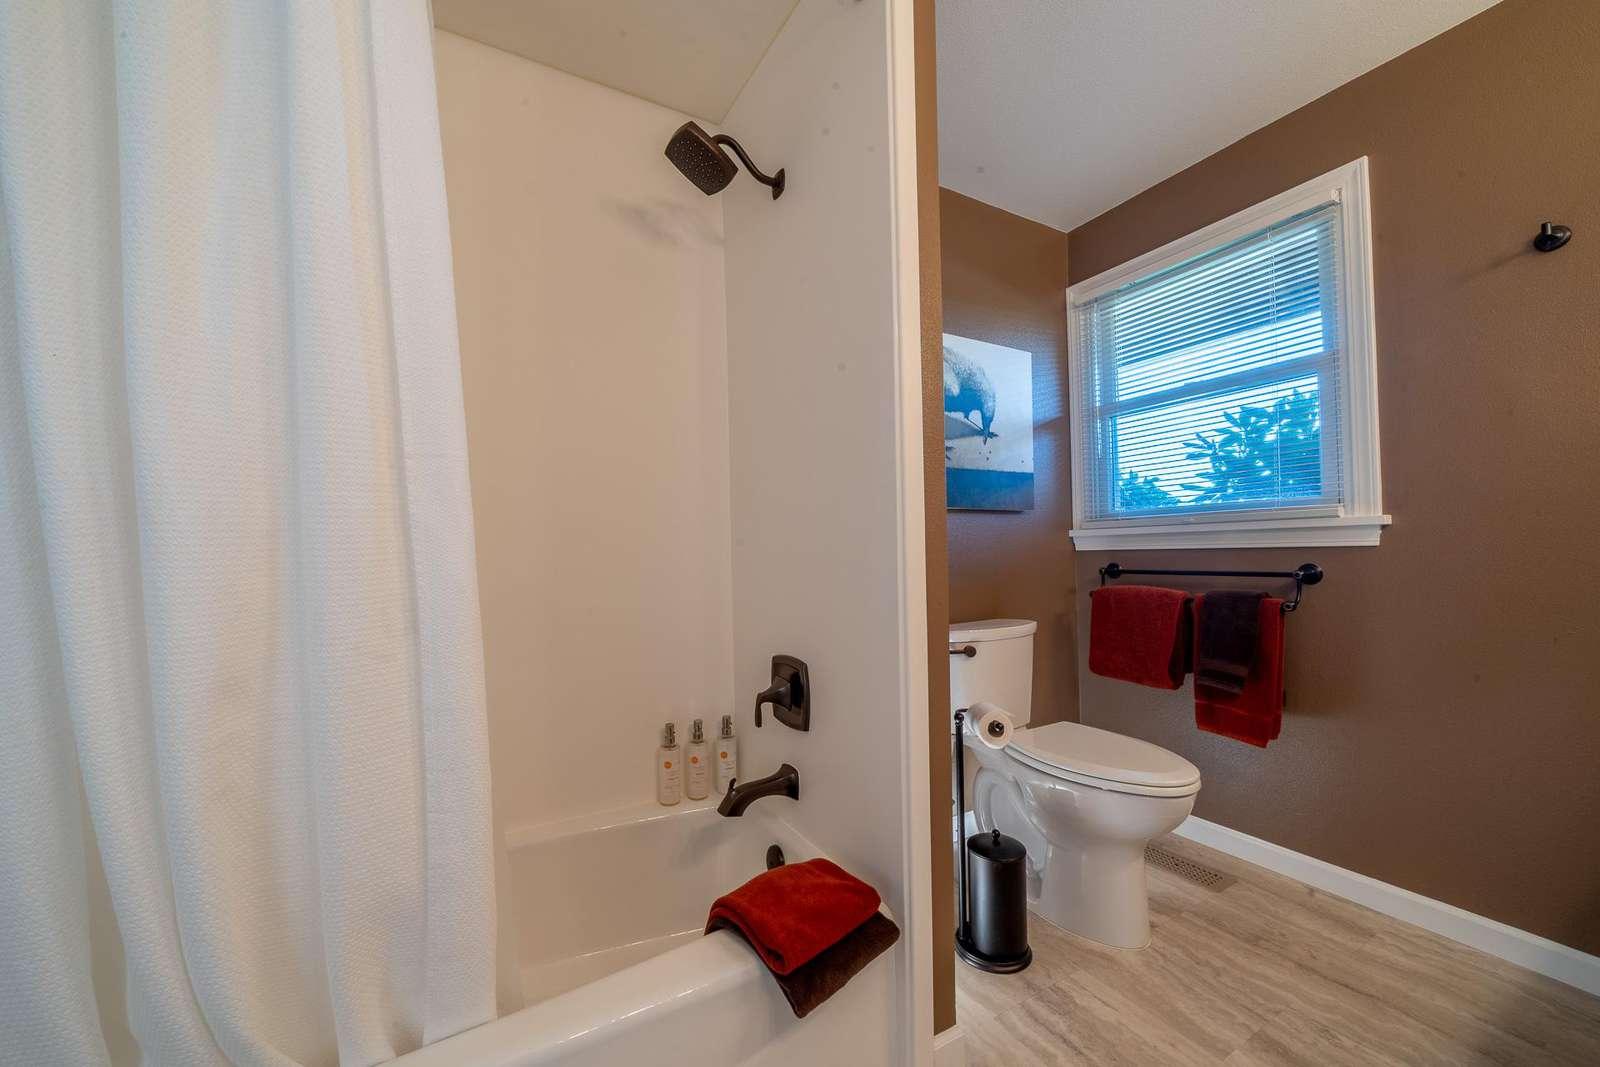 Highland Acres - Hall Bathroom - Spacious with Tub and Shower